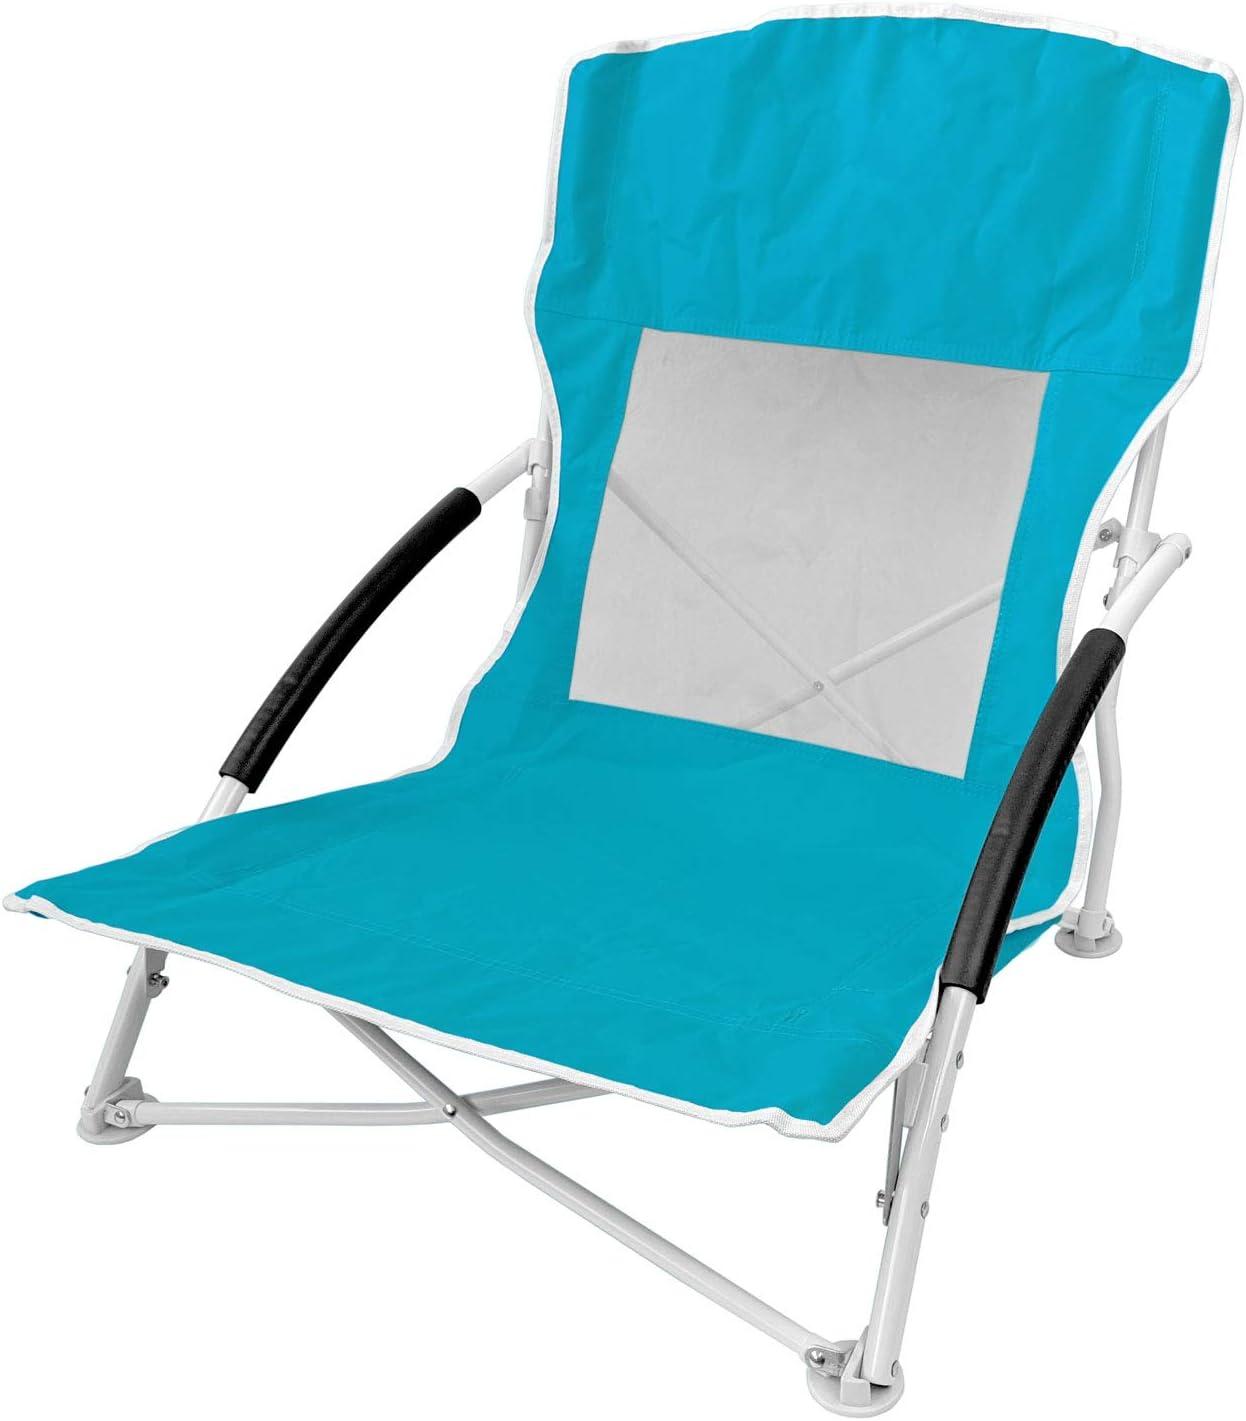 Transporttasche Campingstuhl klappbar Klappstuhl Gartenstuhl Balkonstuhl Farbe:Blau Unbekannt Strandstuhl Faltstuhl inkl